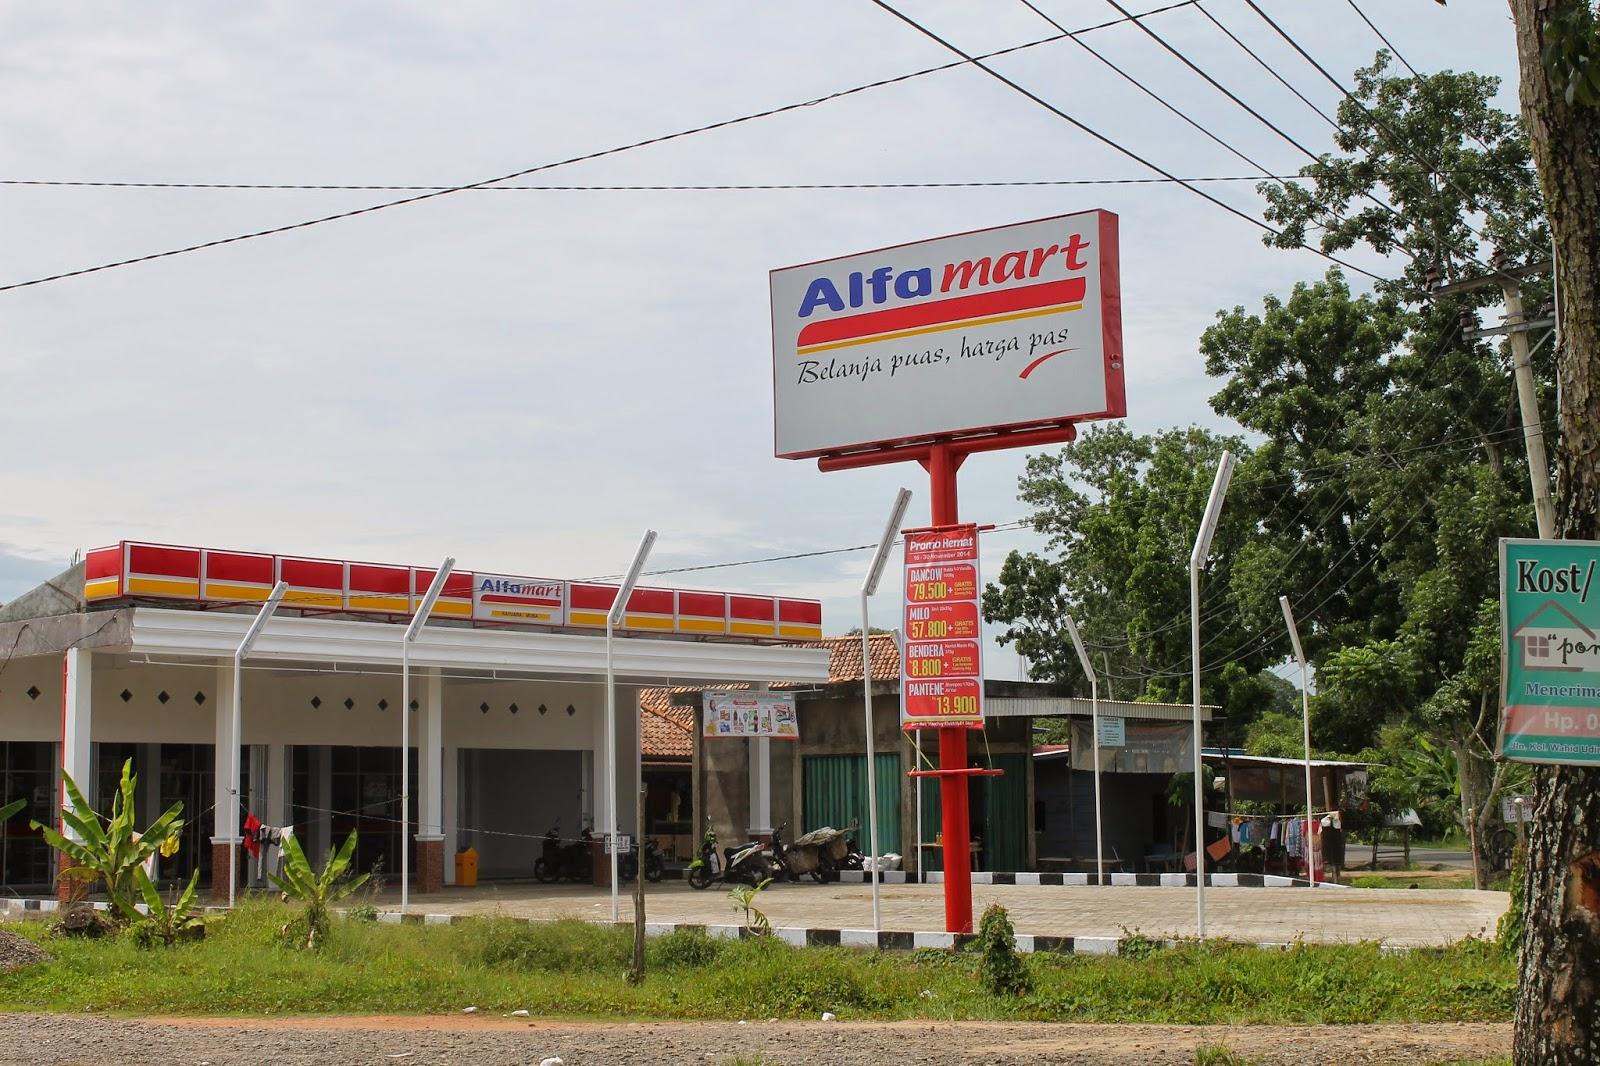 99 Persen Indomaret Dan Alfamart Belum Kantongi Izin Oganpost Voucher Alfa Muba Maupun Di Kabmusi Banyuasin Provinsi Sumatera Selatan Izindari Puluhhan